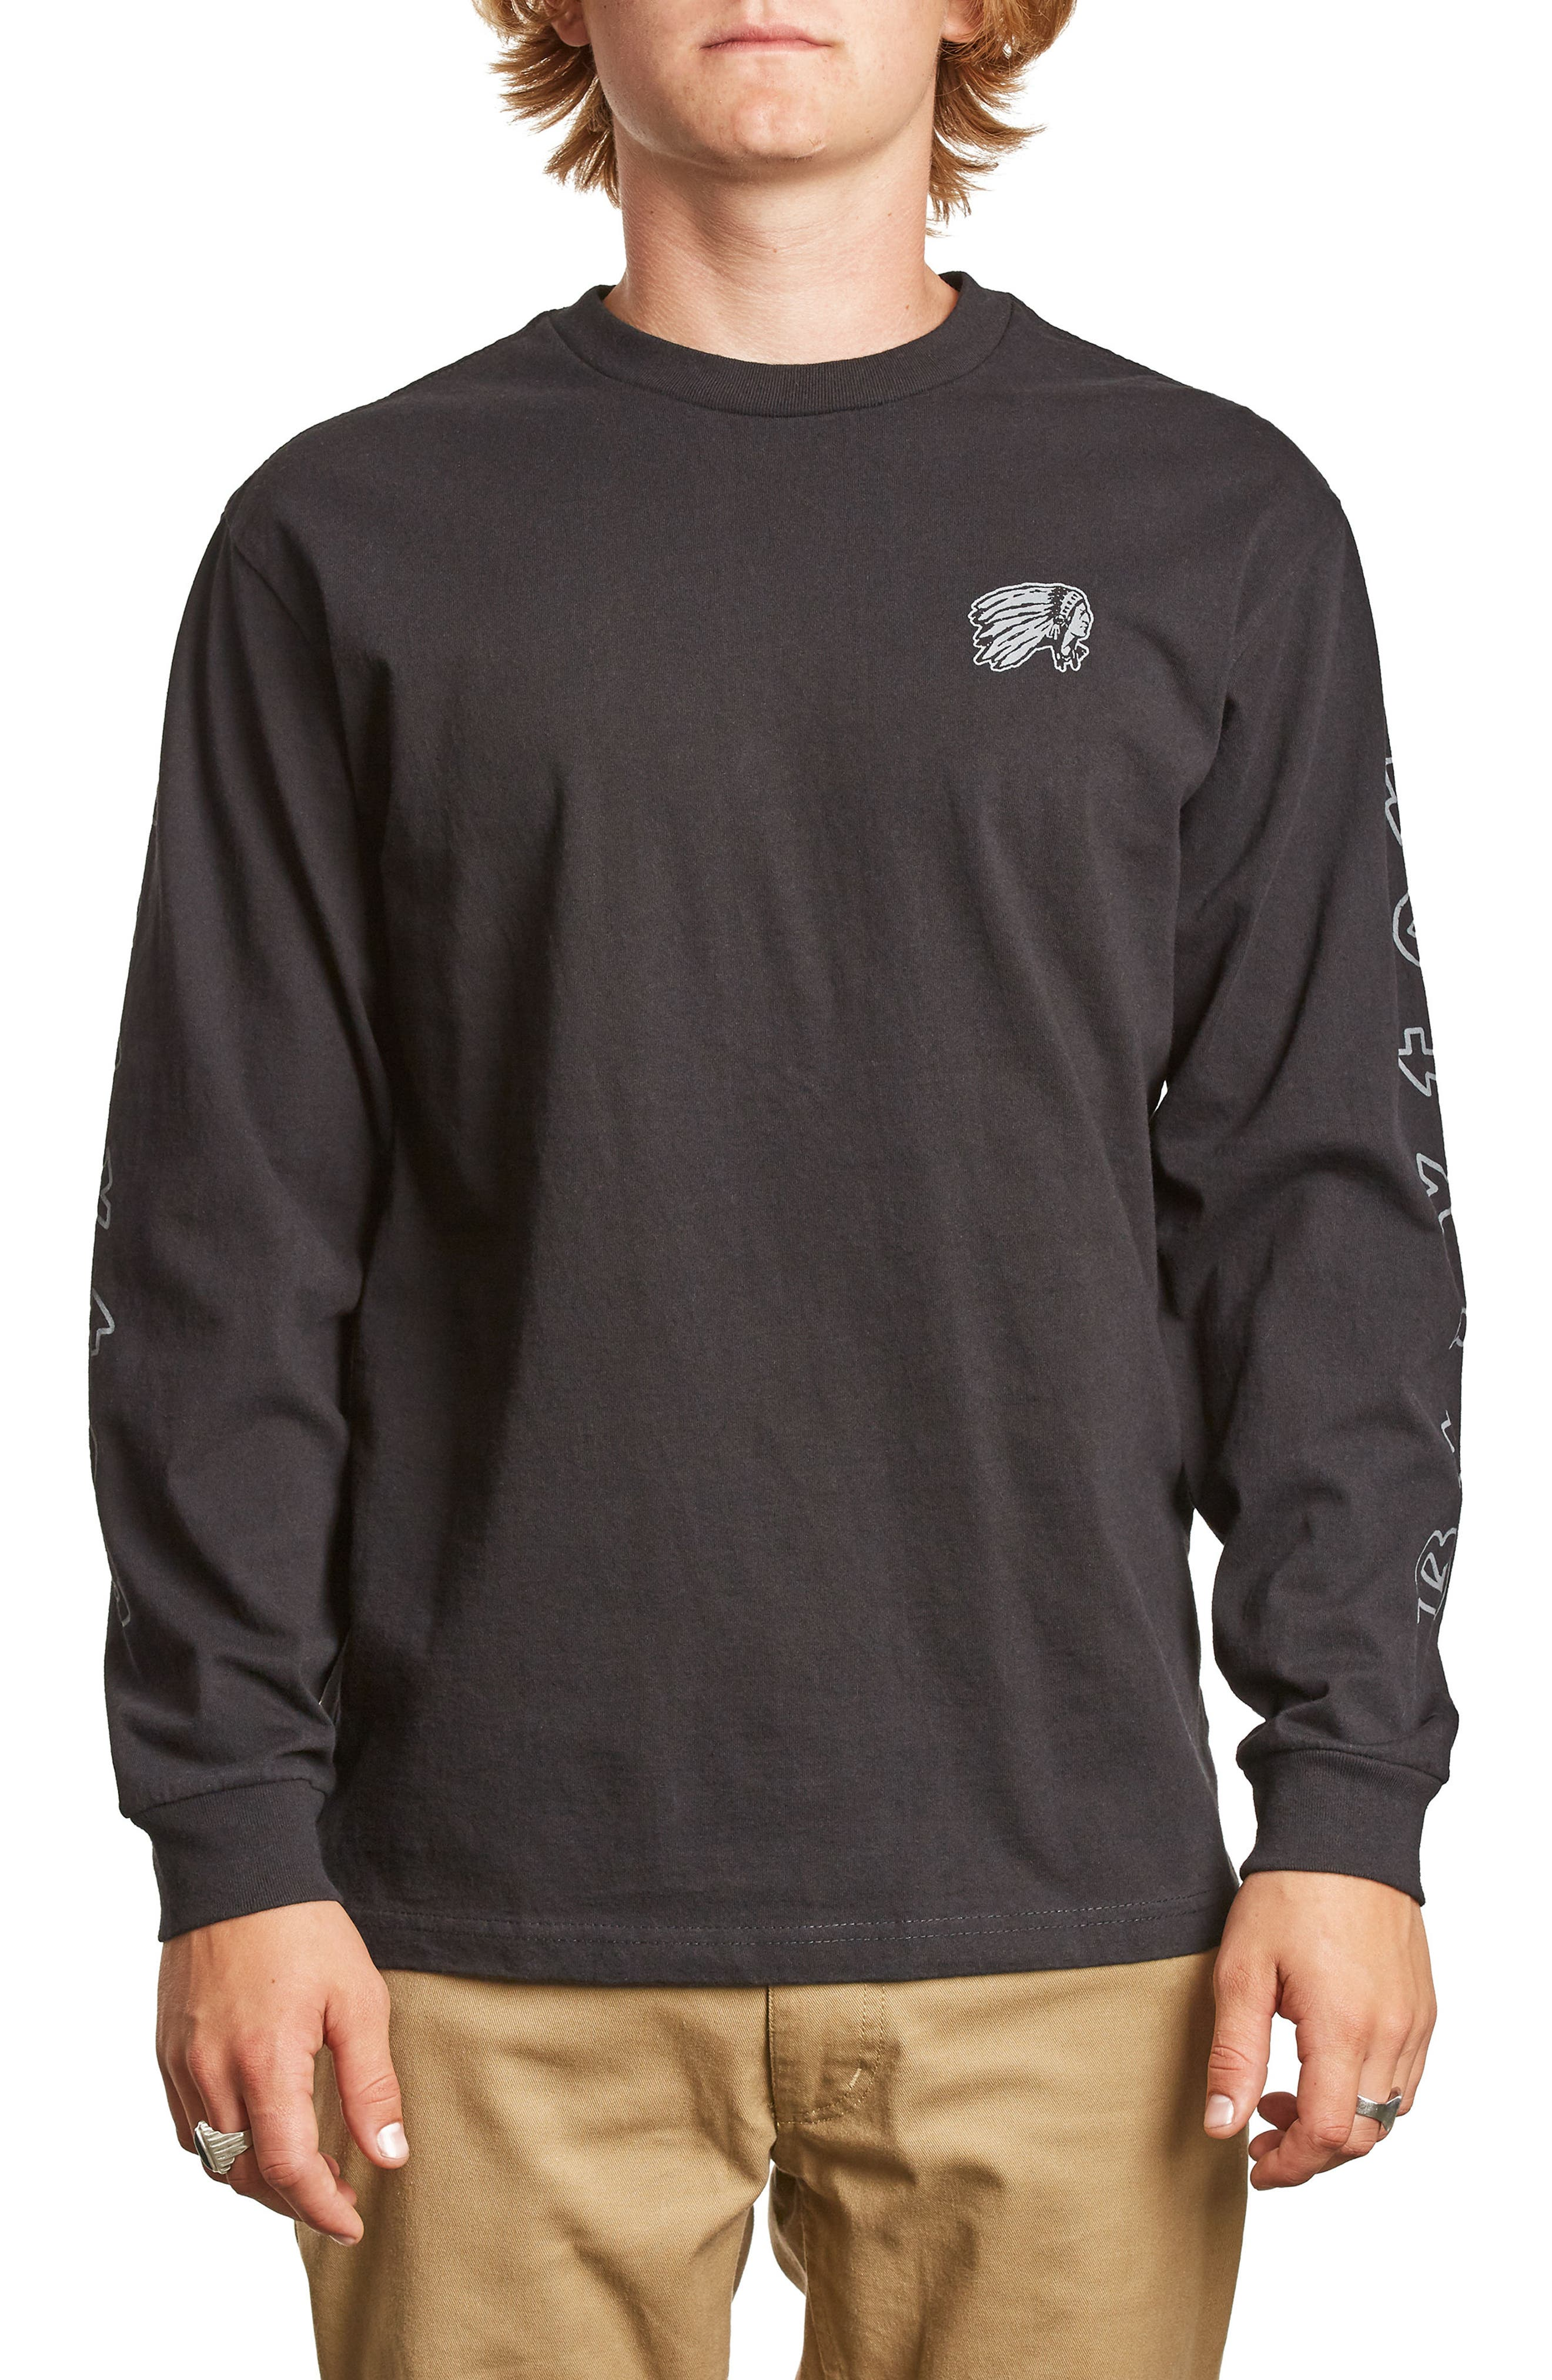 Primo T-Shirt,                             Main thumbnail 1, color,                             Washed Black